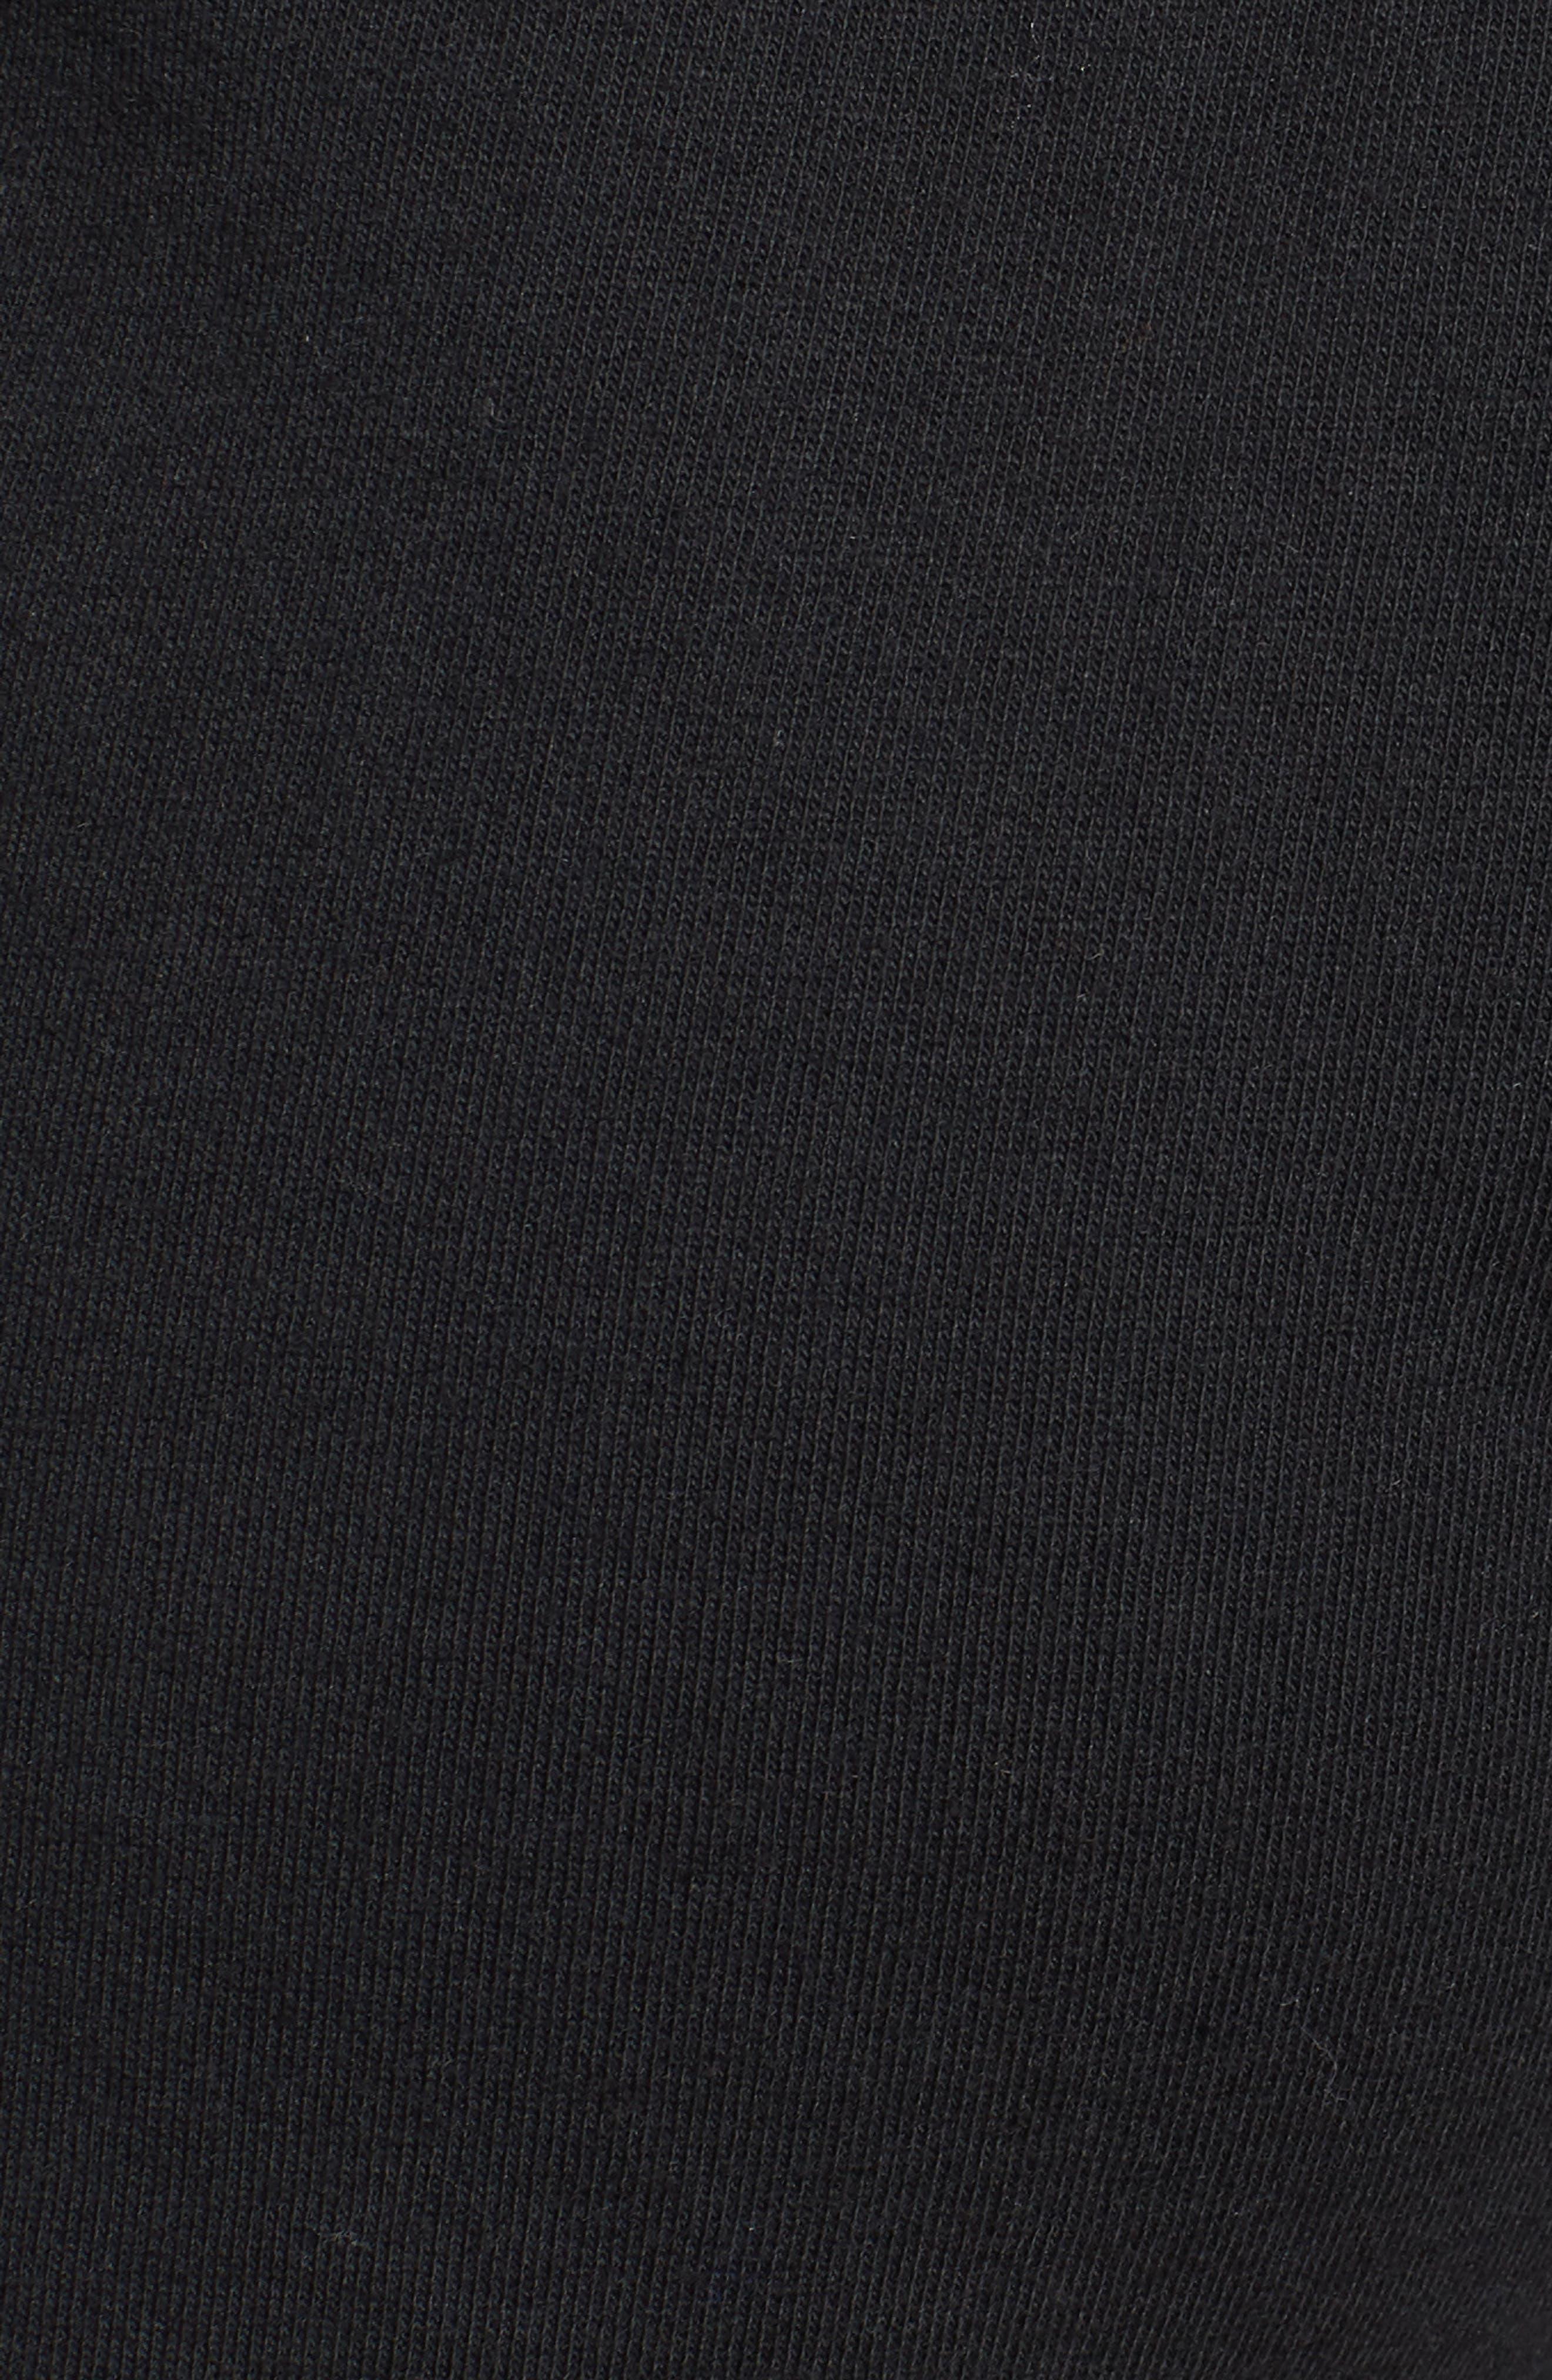 Custard Shorts,                             Alternate thumbnail 5, color,                             001